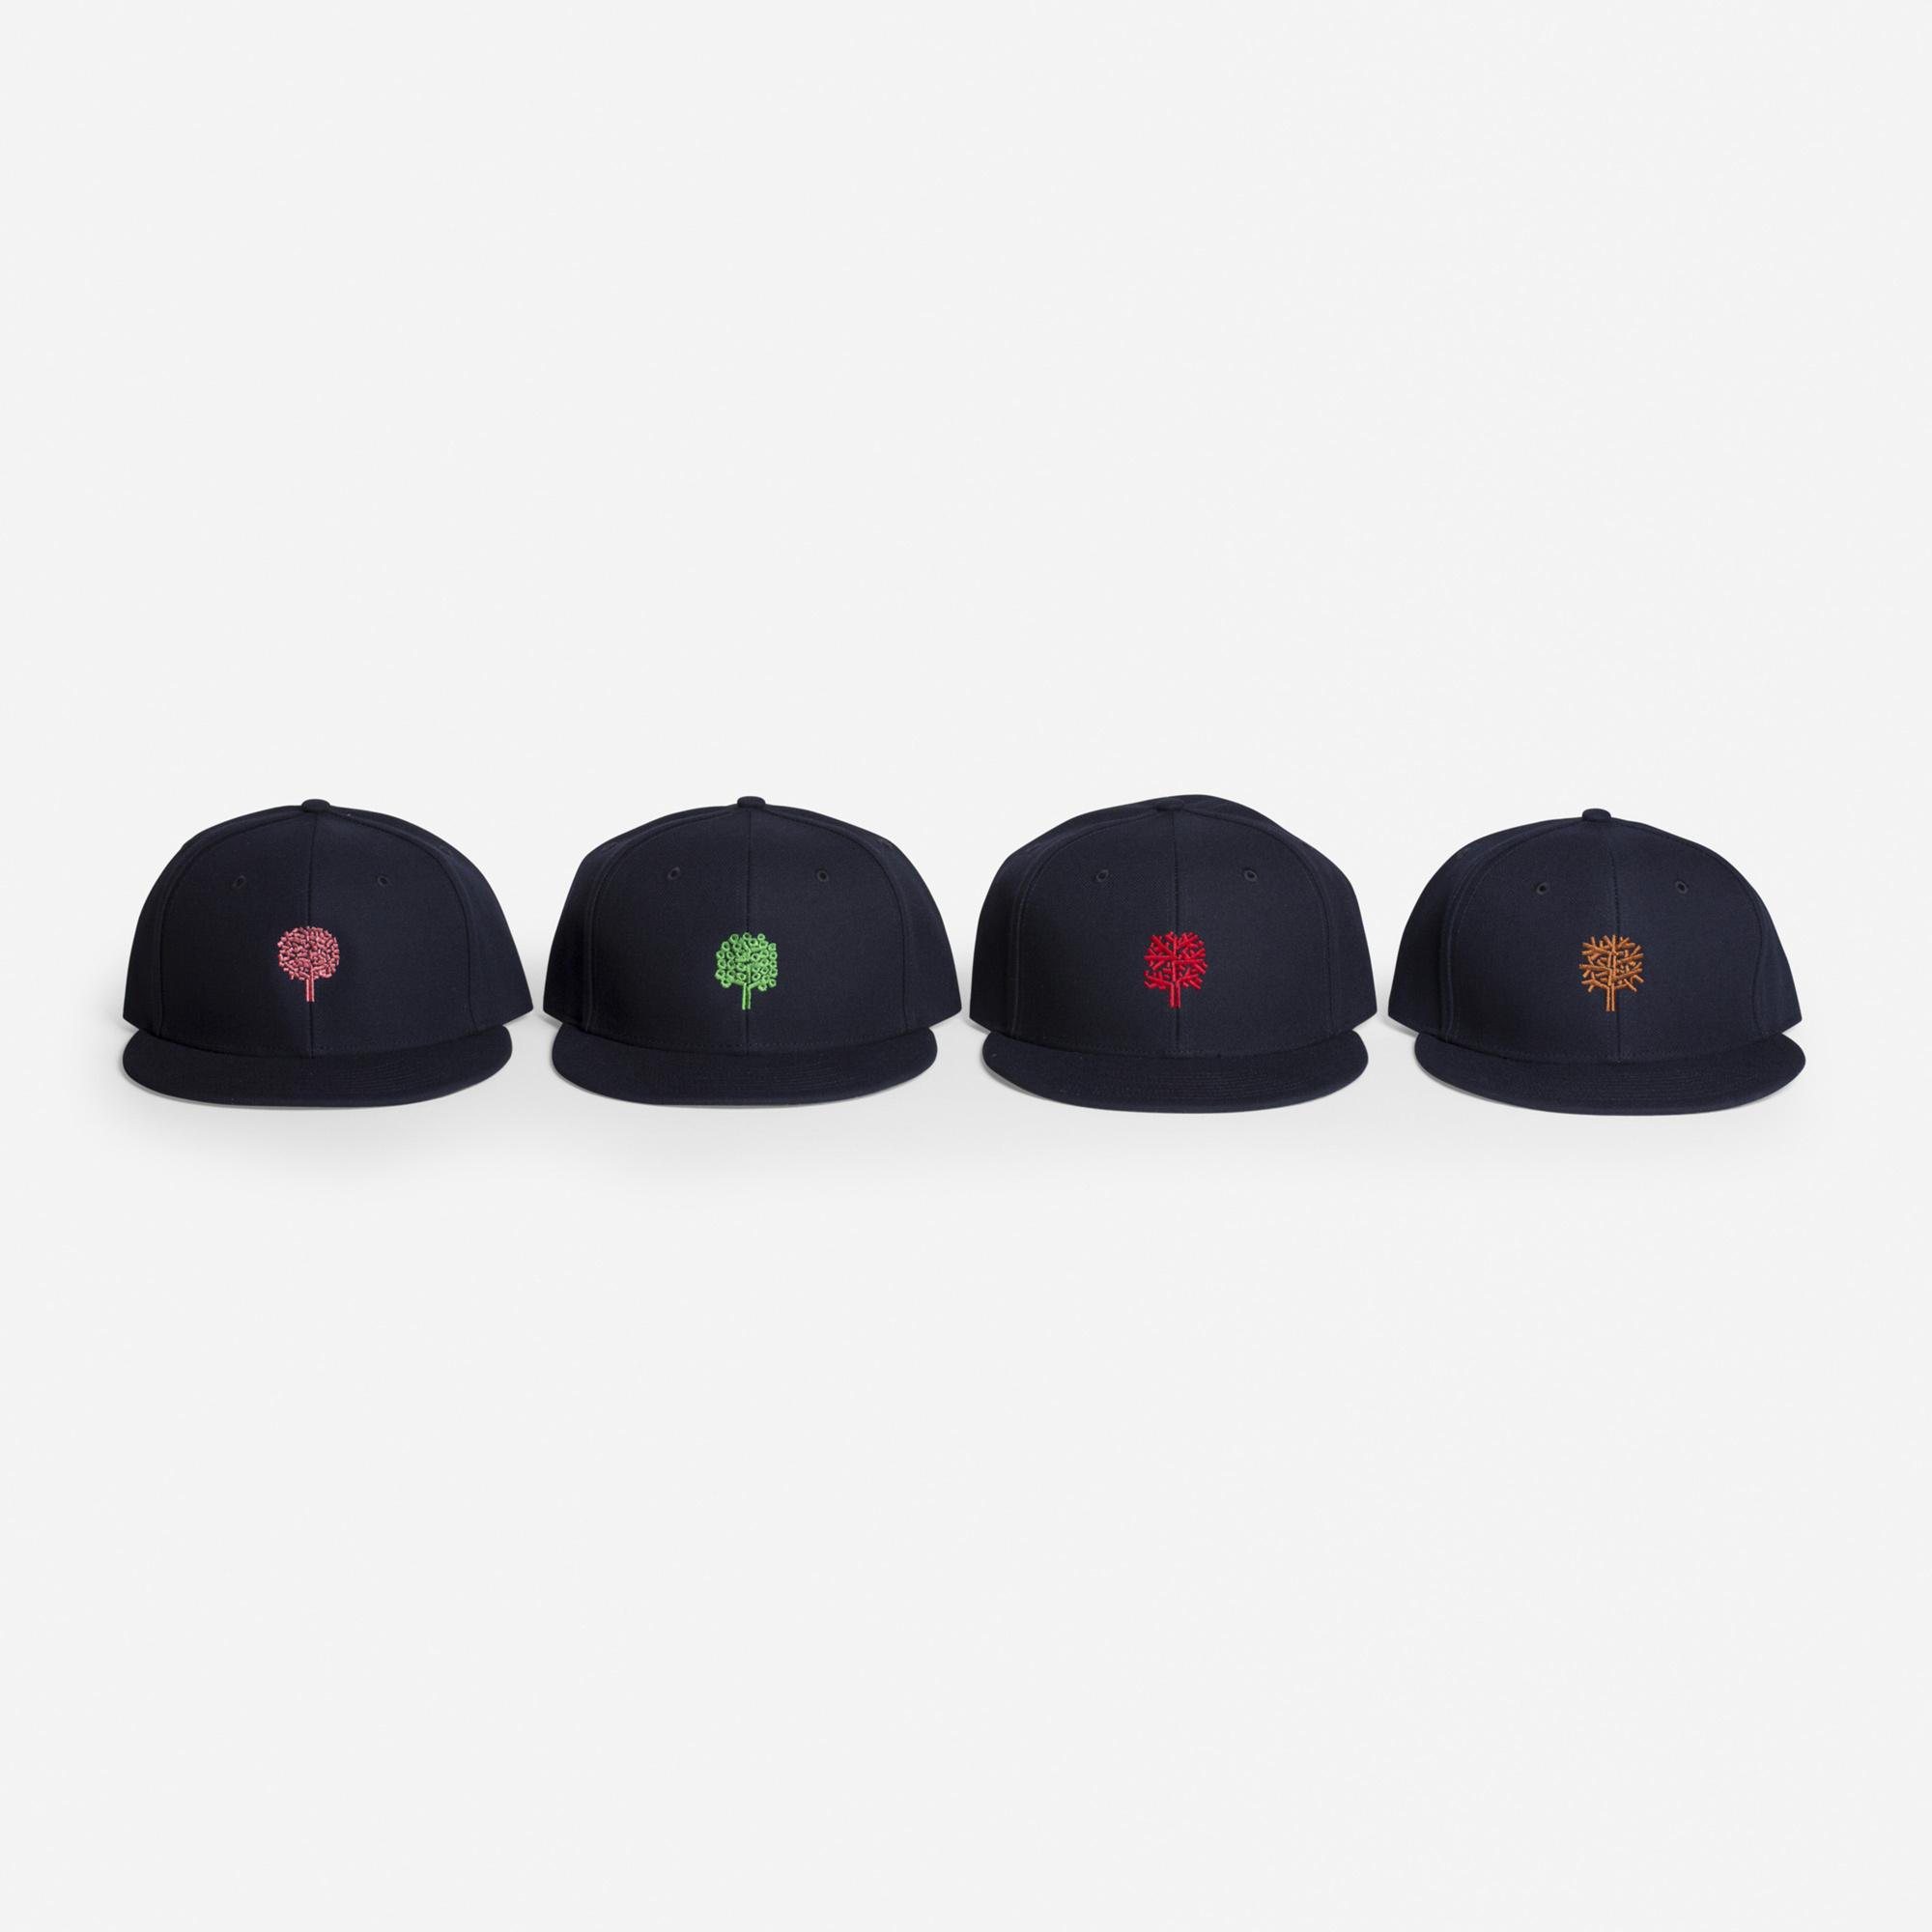 925:  / Four Seasons ball caps, set of four (1 of 1)